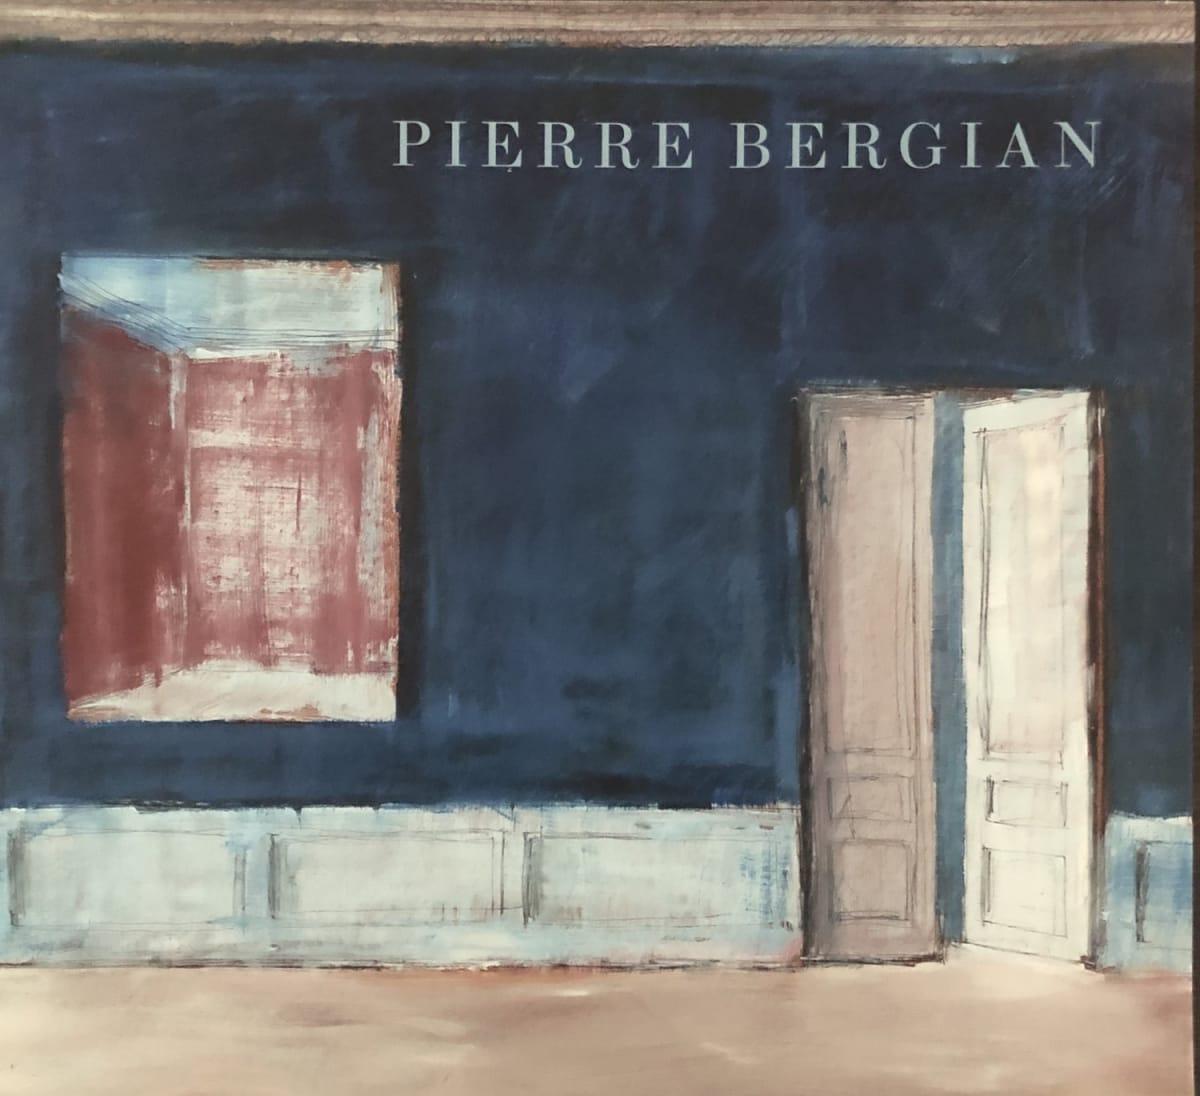 Pierre Bergian